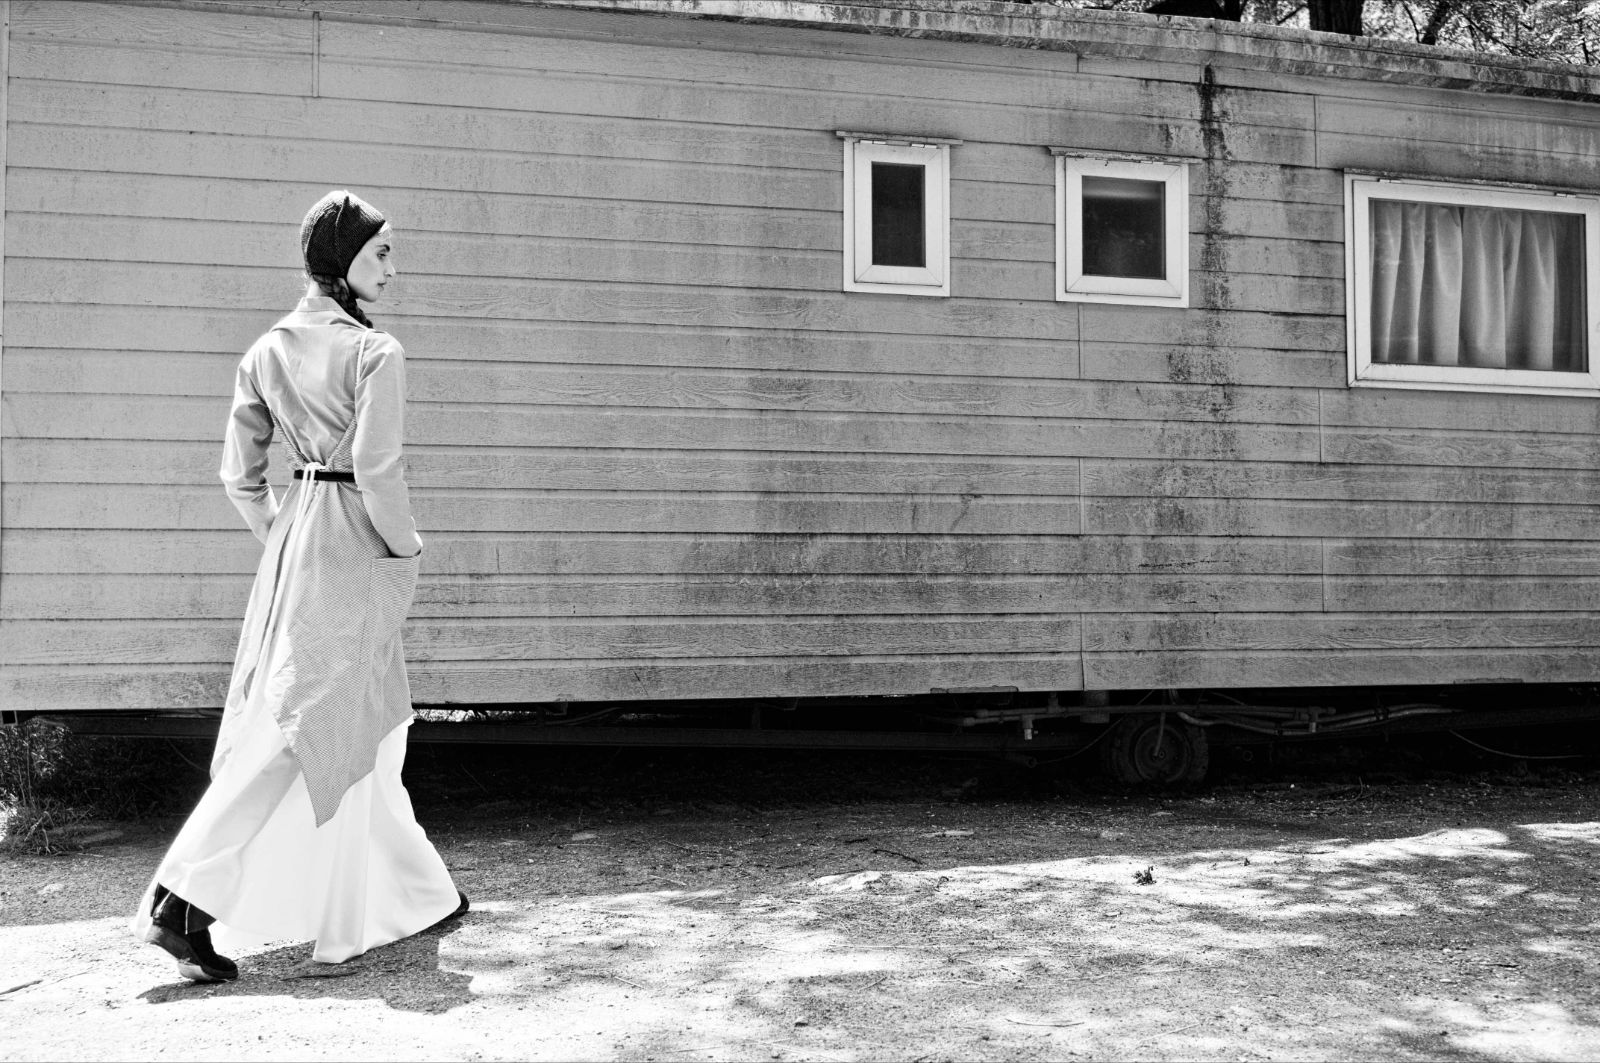 Amish-Attitude_05web